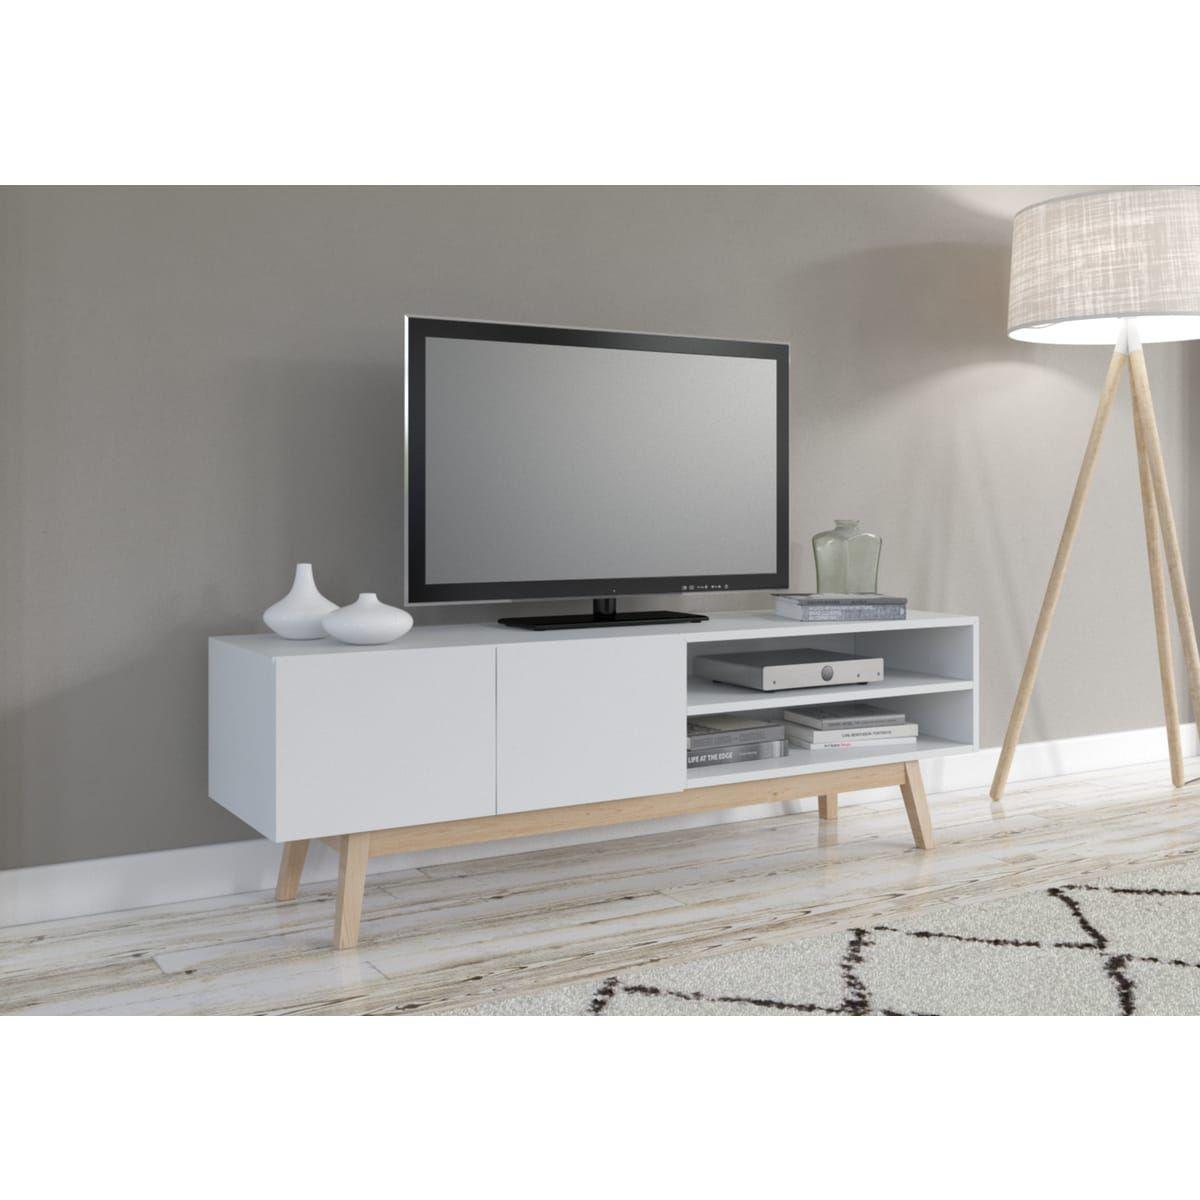 Https Www Auchan Fr P C1002025 Gallery Index 0 Firstcolor Meuble Tv Scandinave Meuble Mobilier De Salon